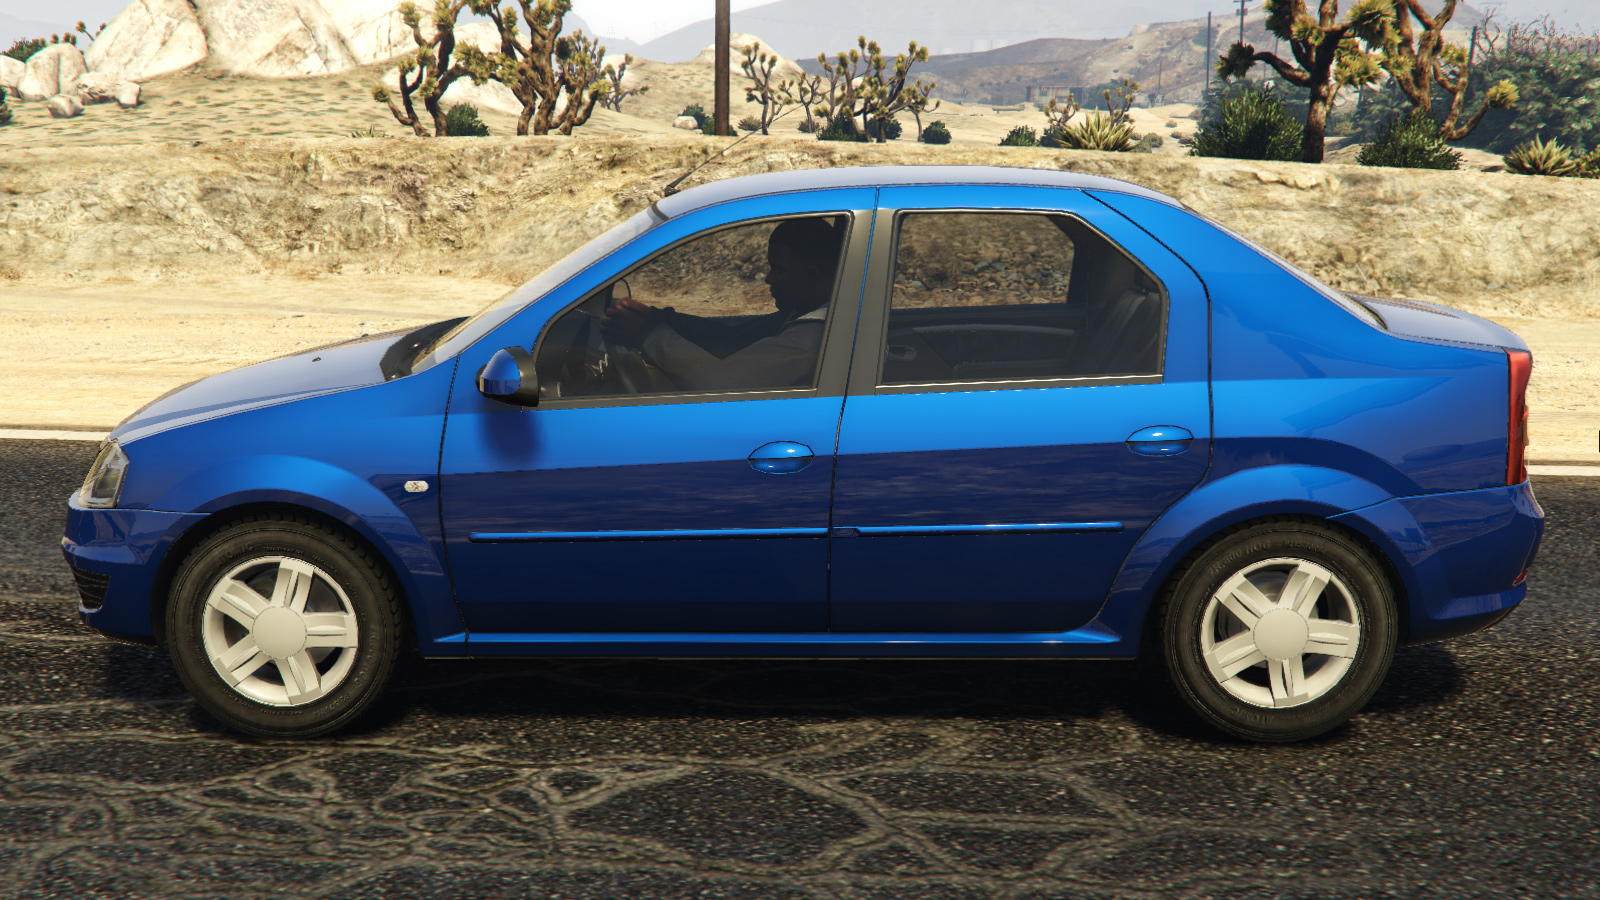 2008 Dacia Logan для GTA V - Скриншот 1